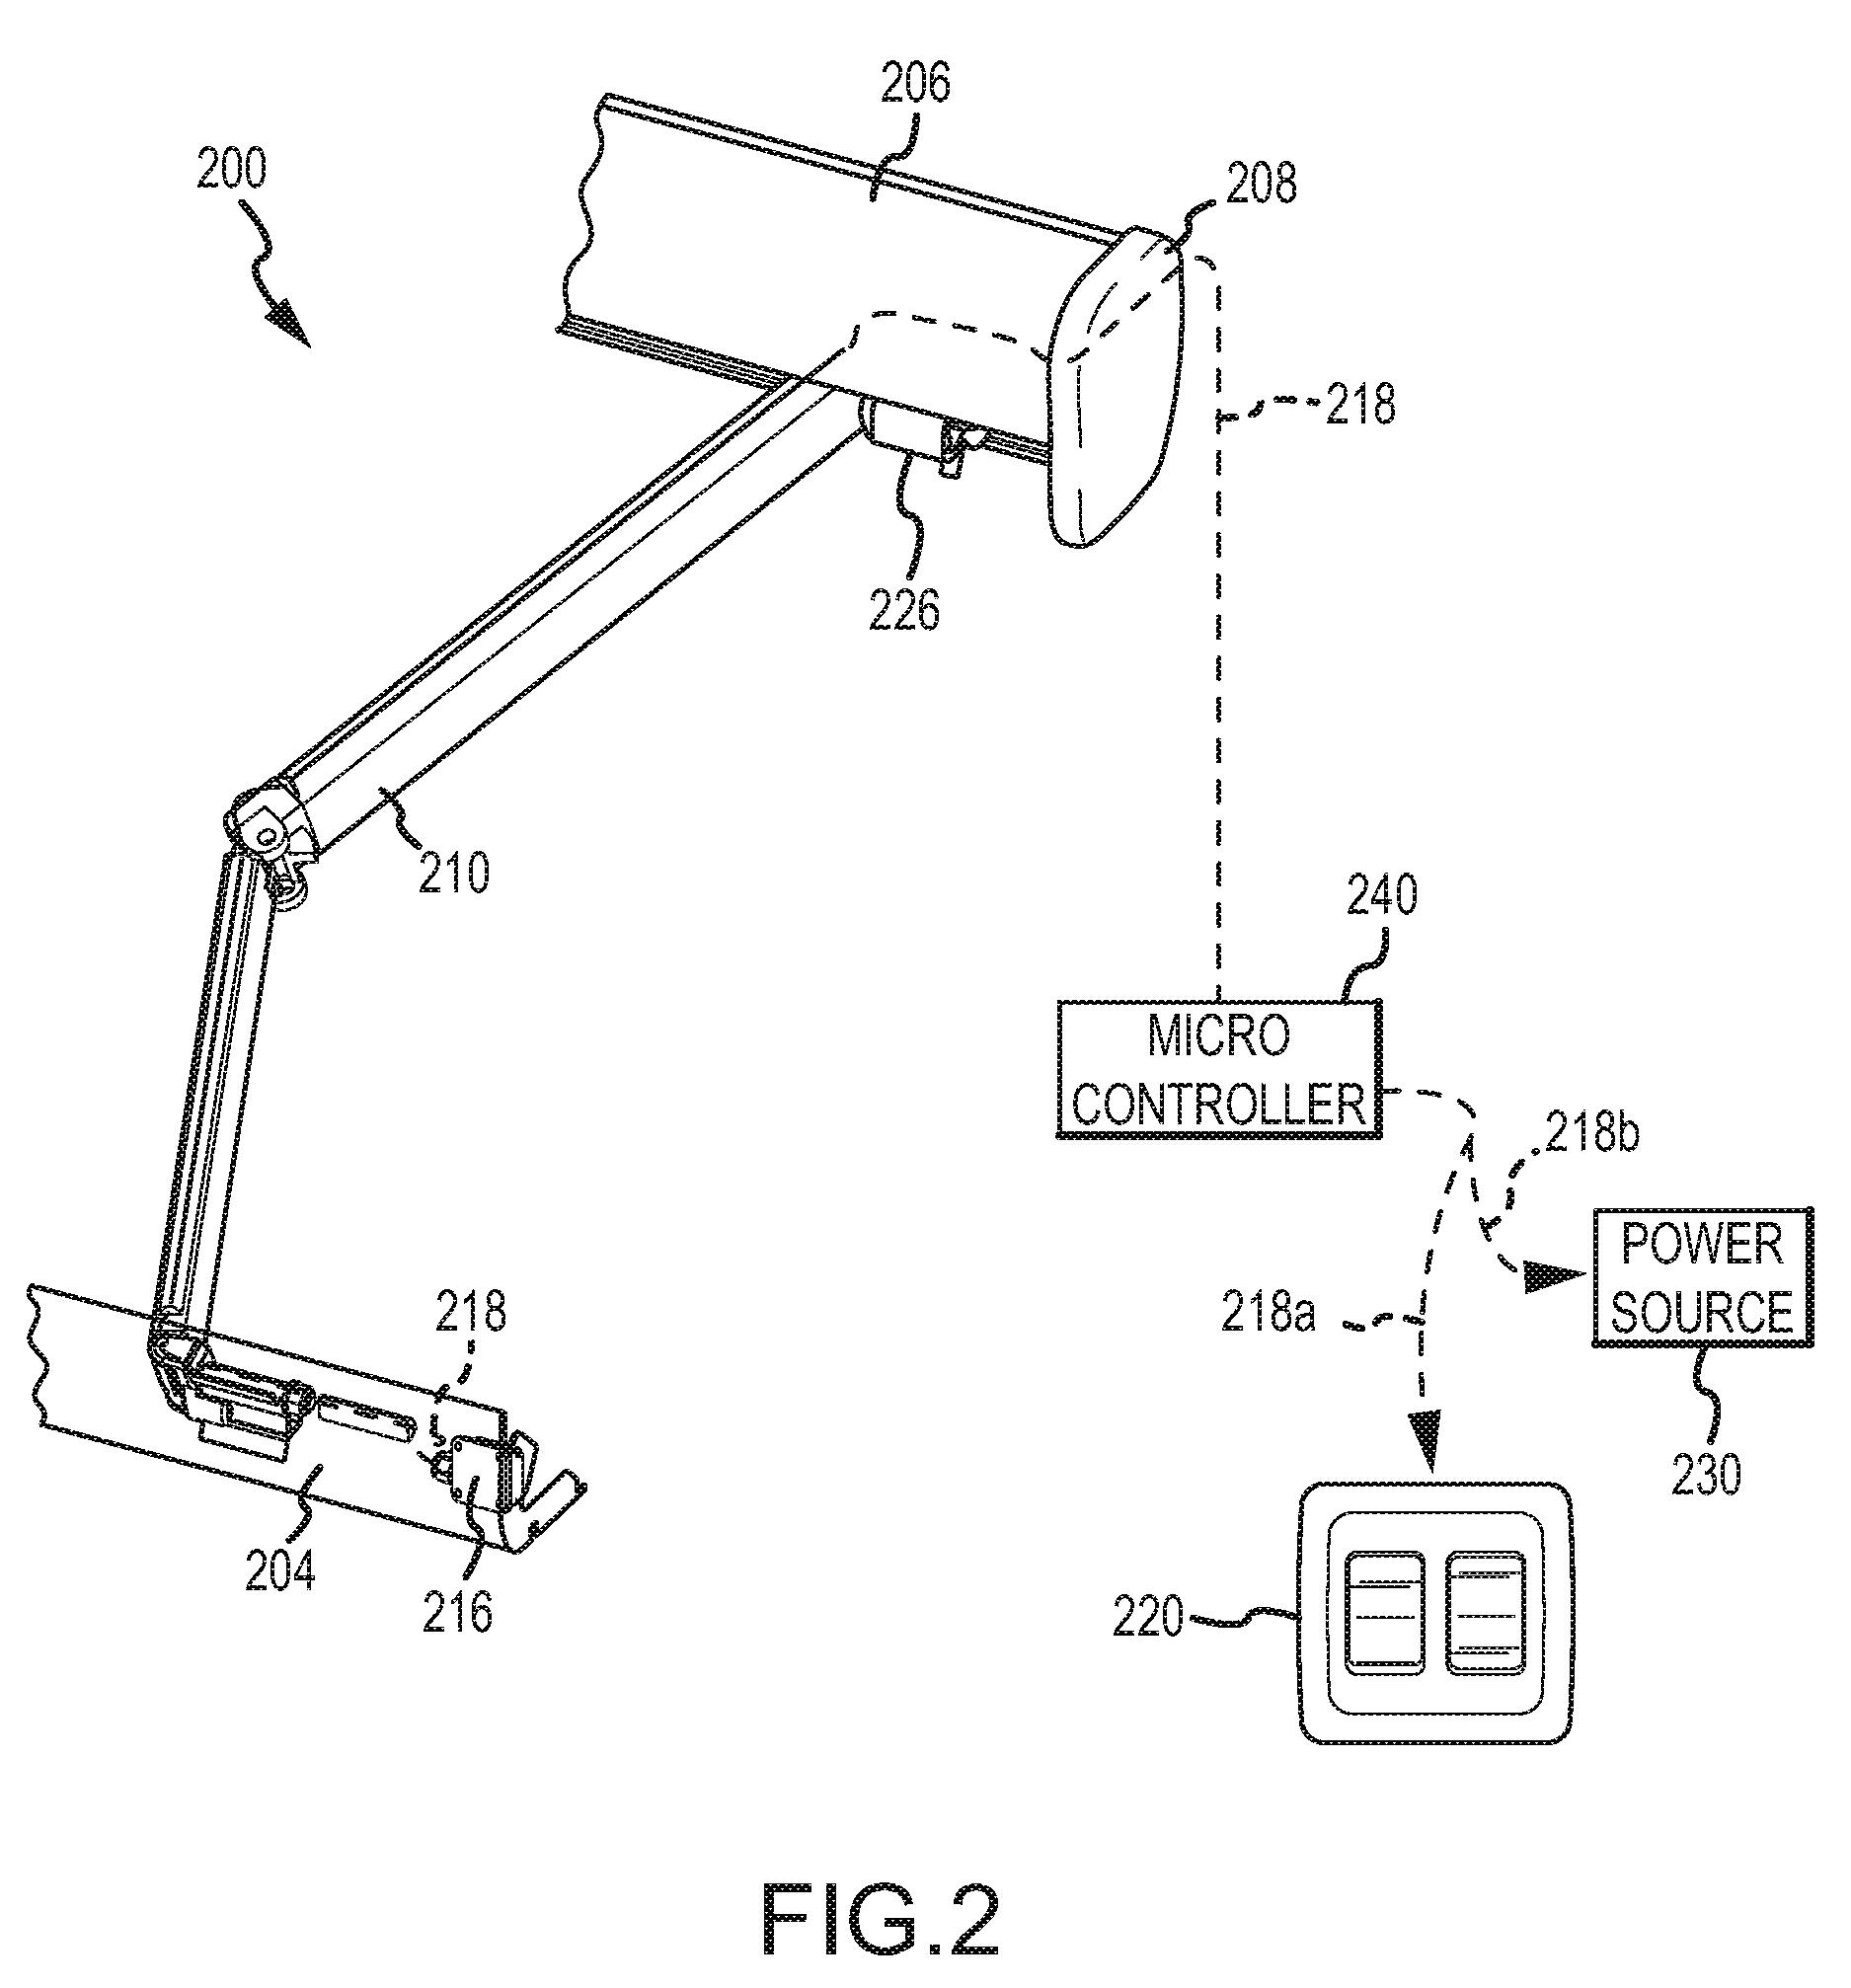 Bose 301 Series Iv Box Wiring Diagram - Usb Car Charger Wire Diagram -  cummis.2020ok-jiwa.jeanjaures37.frWiring Diagram Resource